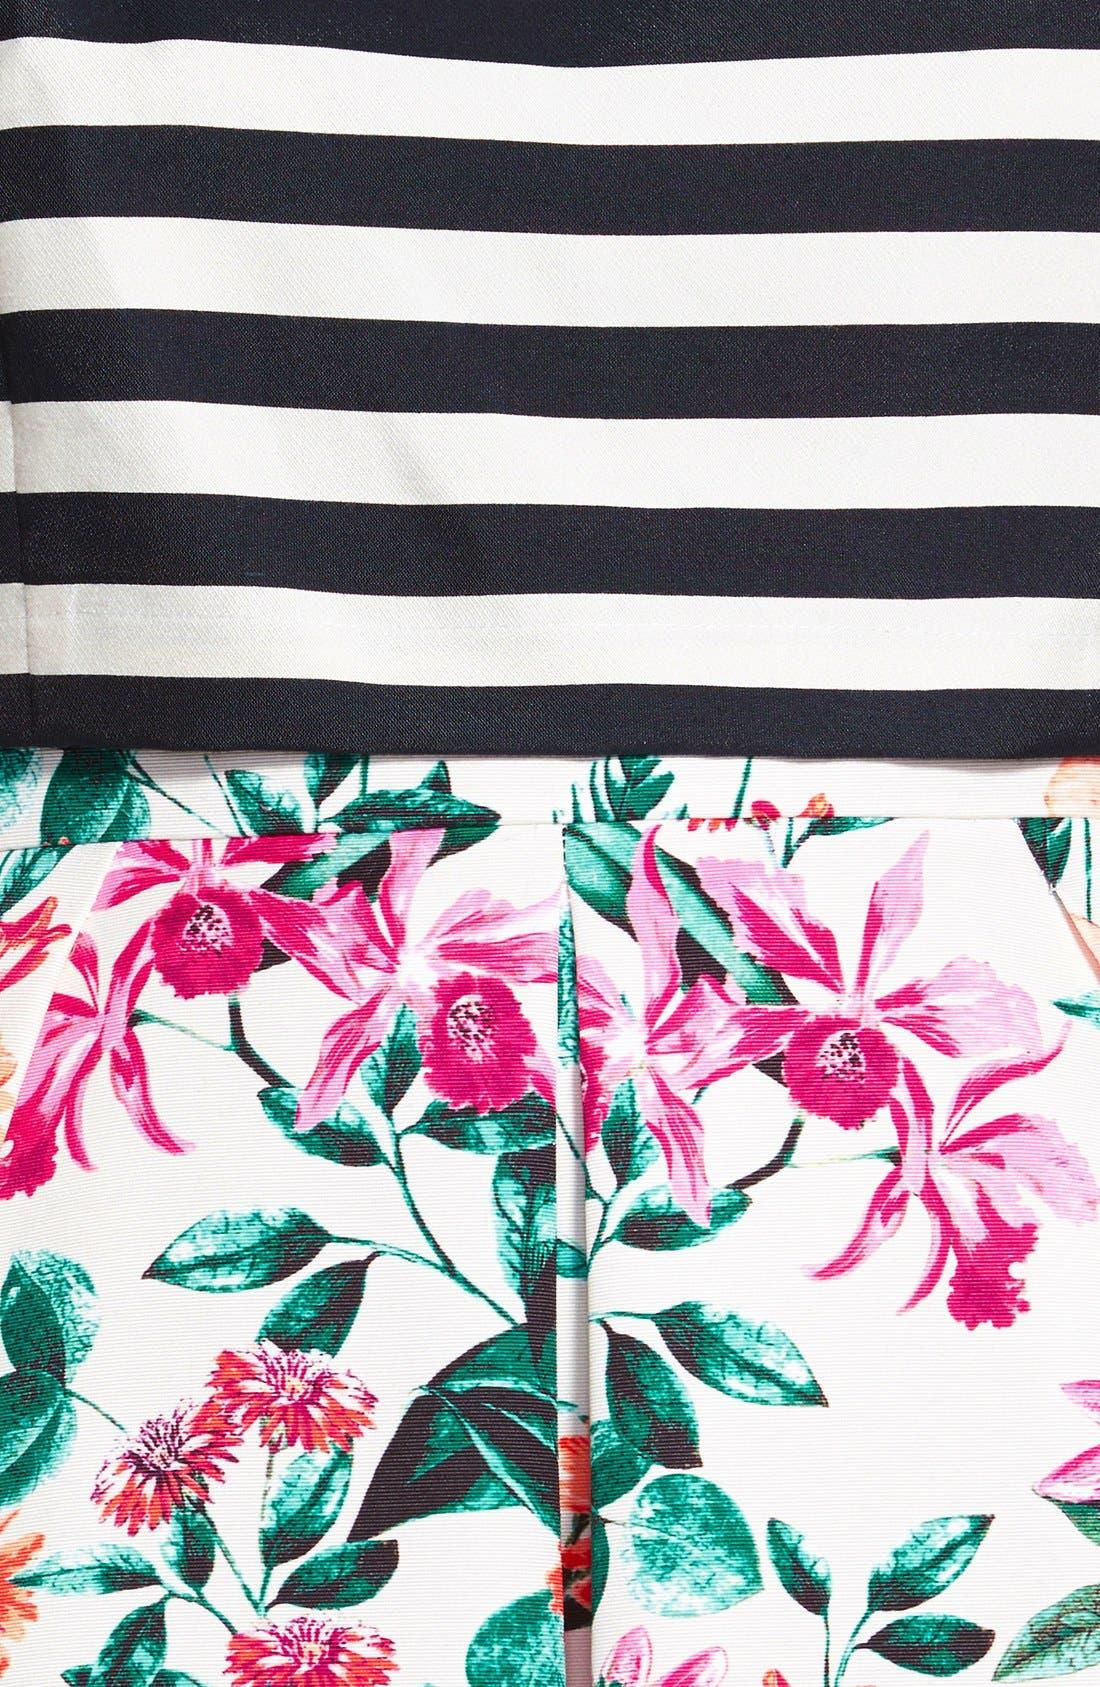 Mixed Print Bodice Overlay Dress,                             Alternate thumbnail 3, color,                             900